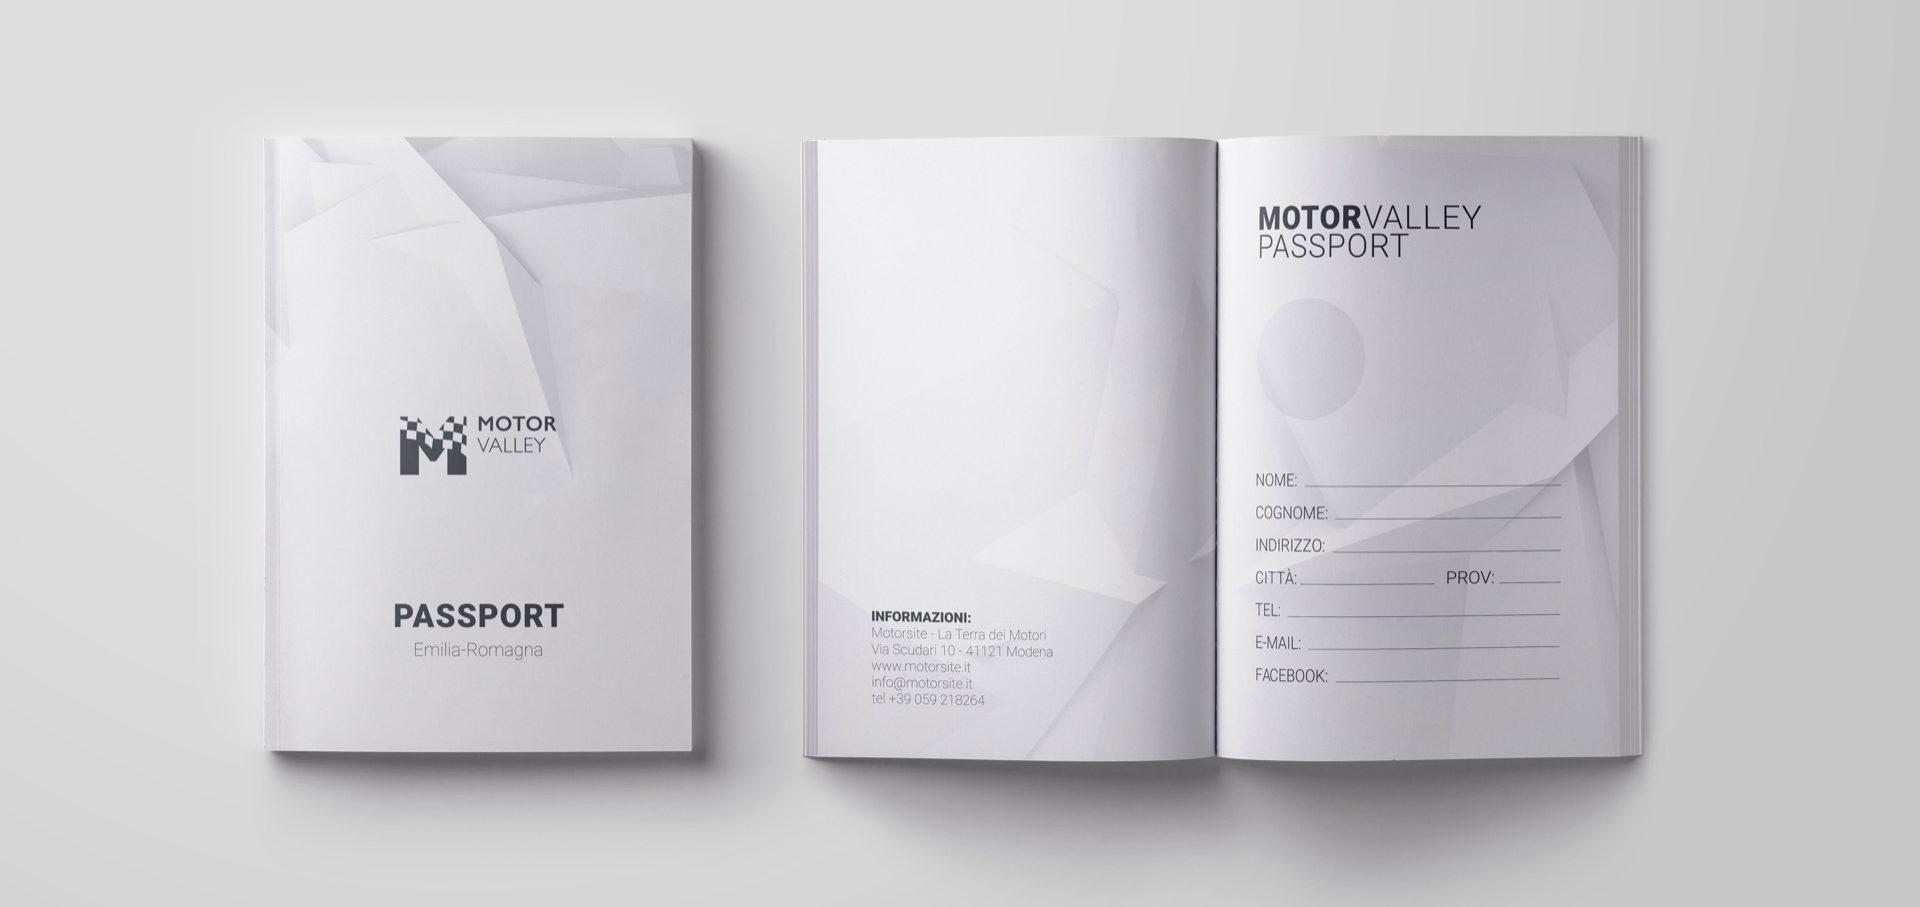 01_Mockup-Passaporto